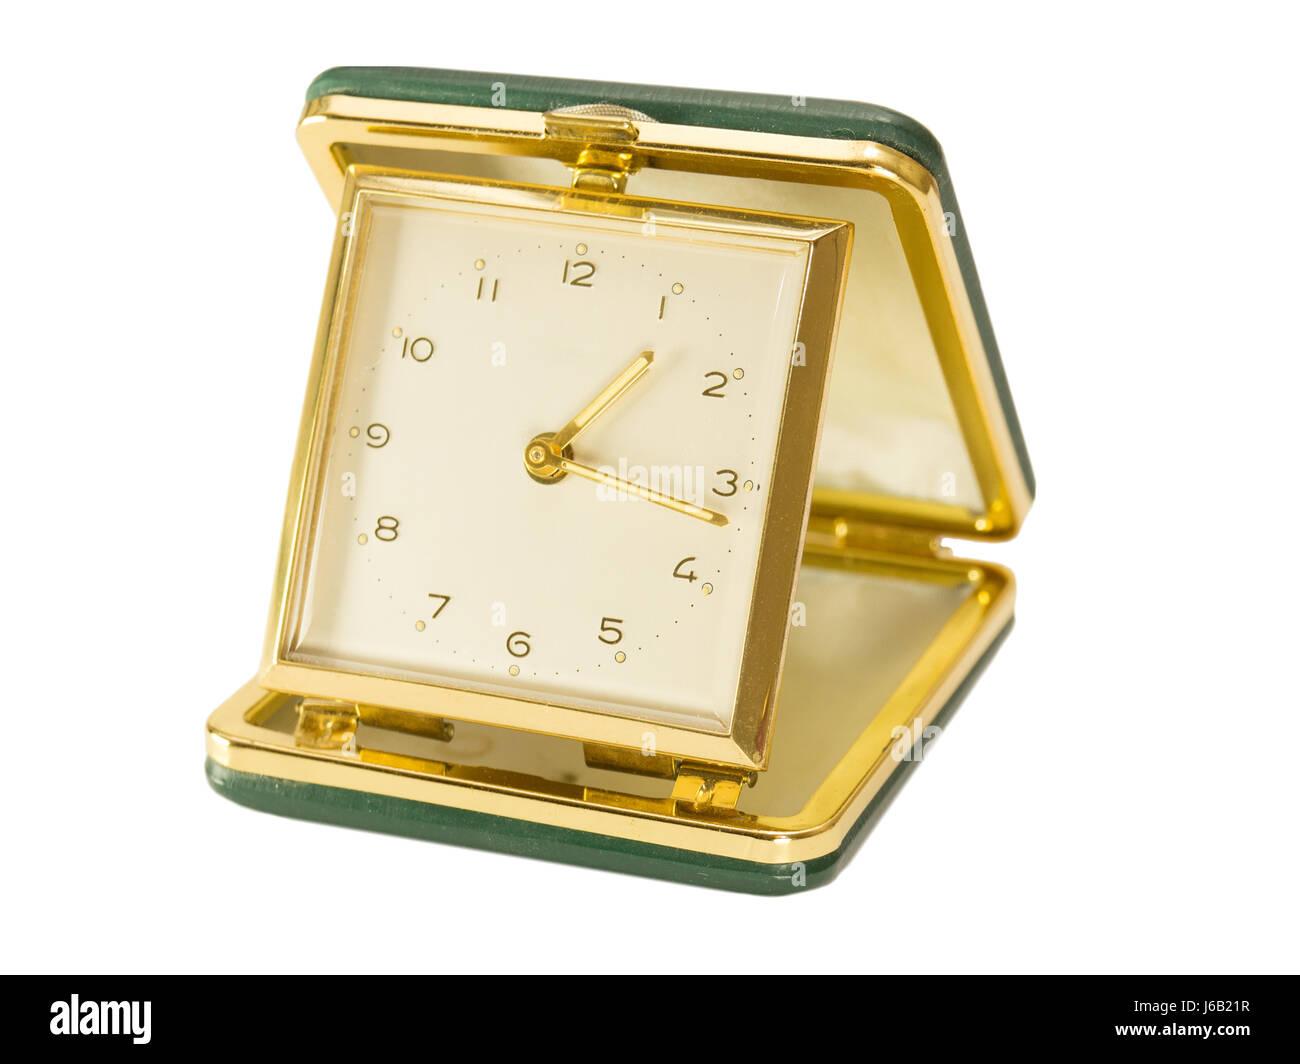 Green Wind Up Travel Vintage Alarm Clock Stock Photo 141613971 Alamy